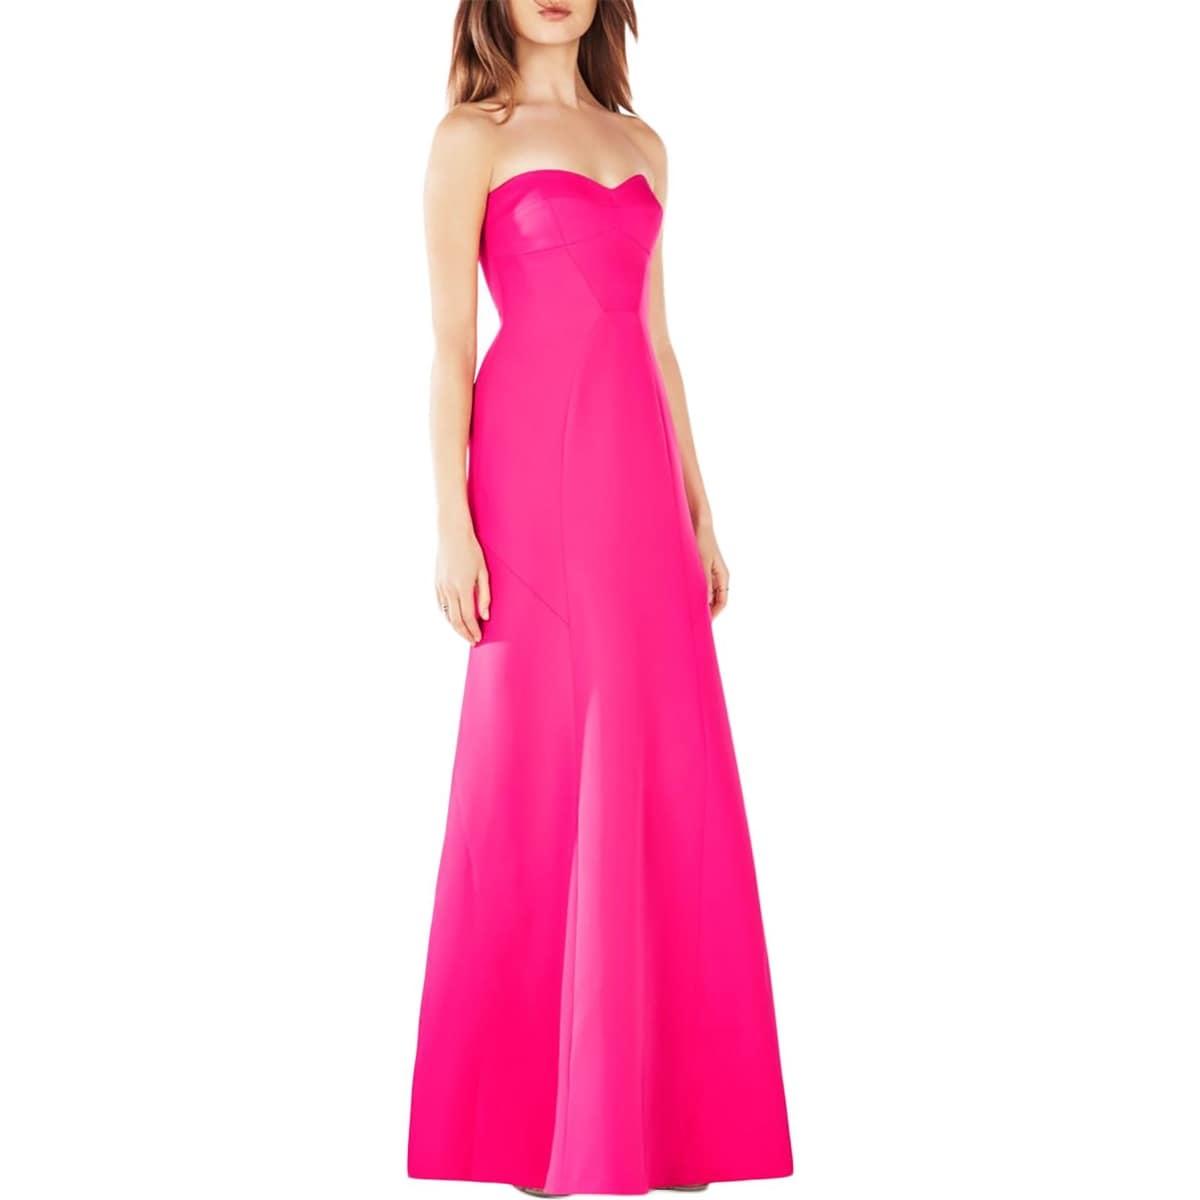 Fantástico Bcbg Vestidos De Novia Modelo - Colección de Vestidos de ...